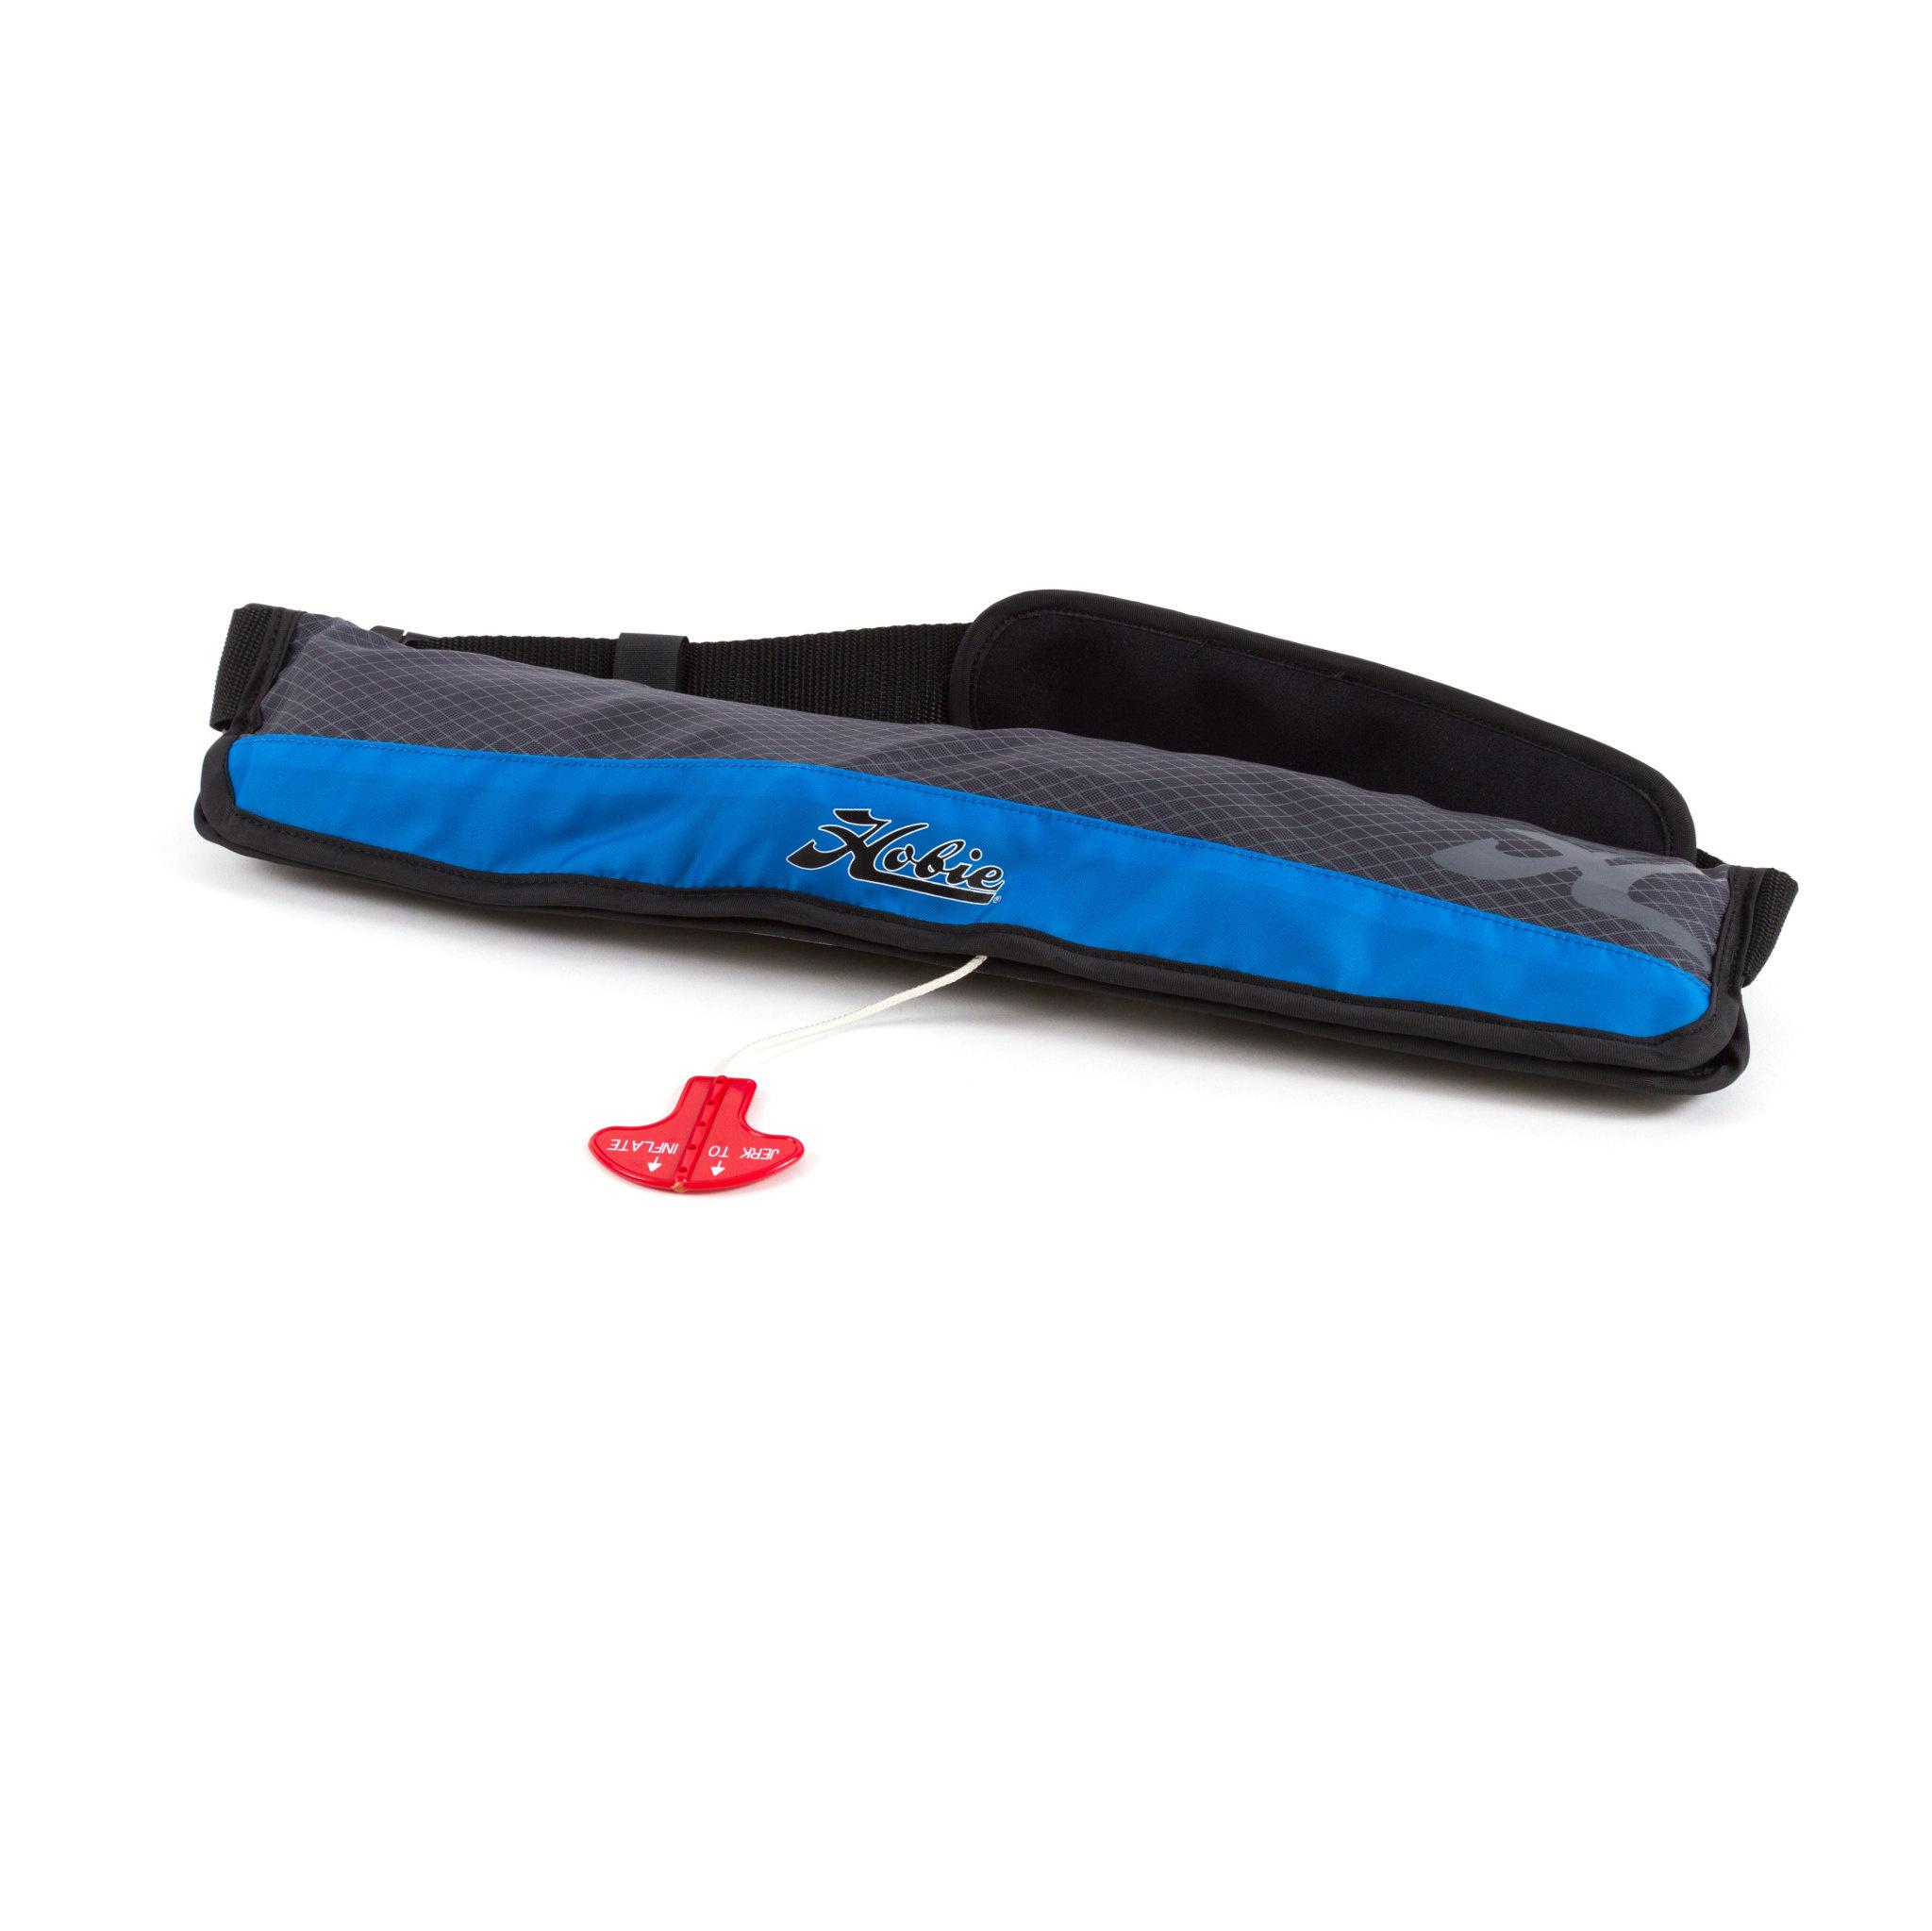 Hobie Cat Company Hobie Inflatable PFD SUP Belt Pack